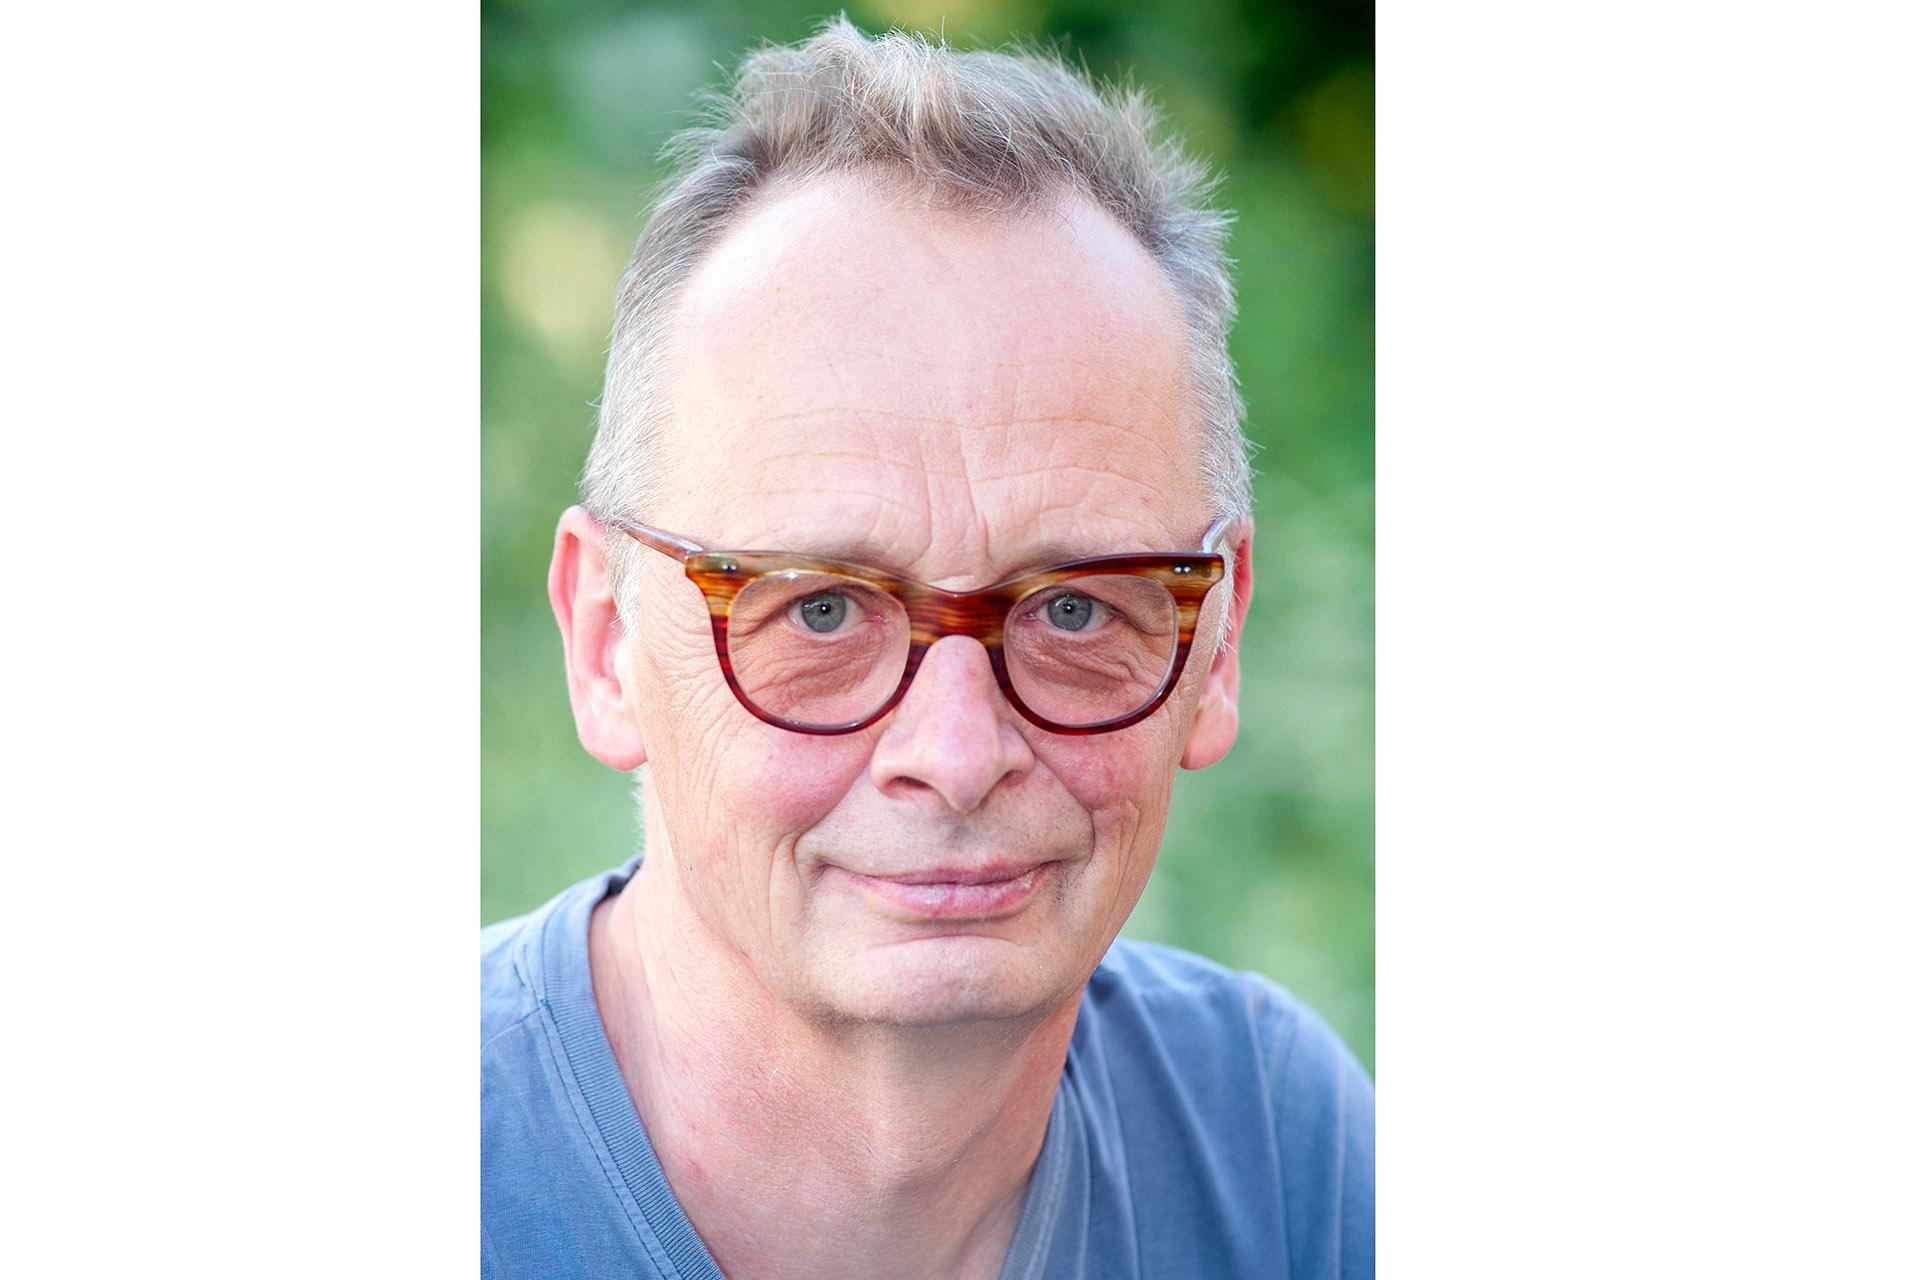 Theaterherbst-Vorstand bestätigt Martin Heesch im Amt